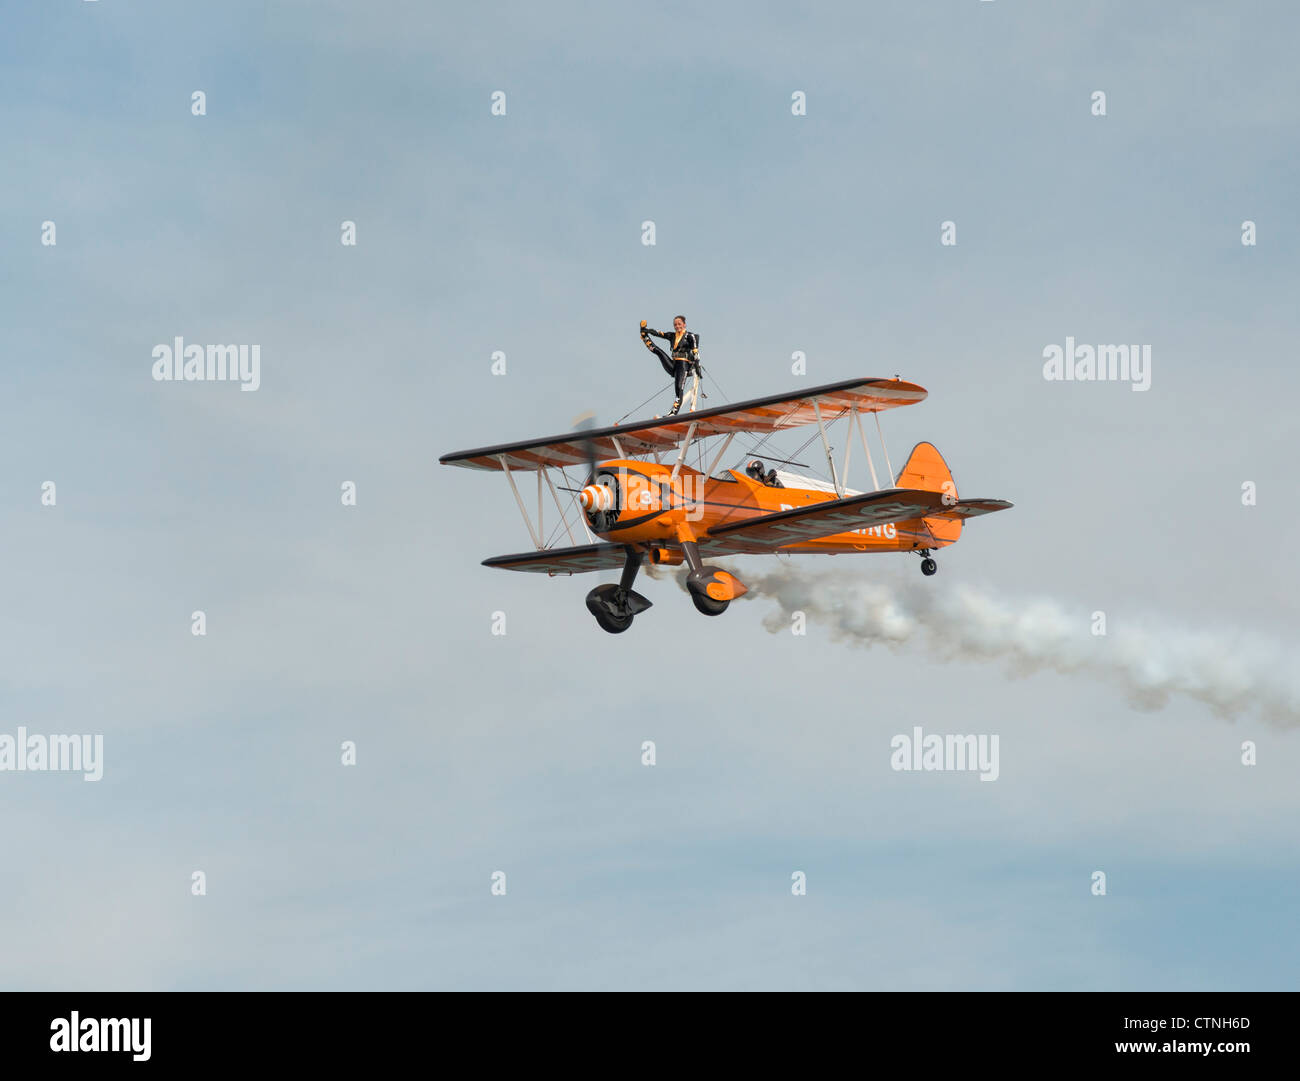 Wingwalker performing at Sunderland International Airshow - Stock Image